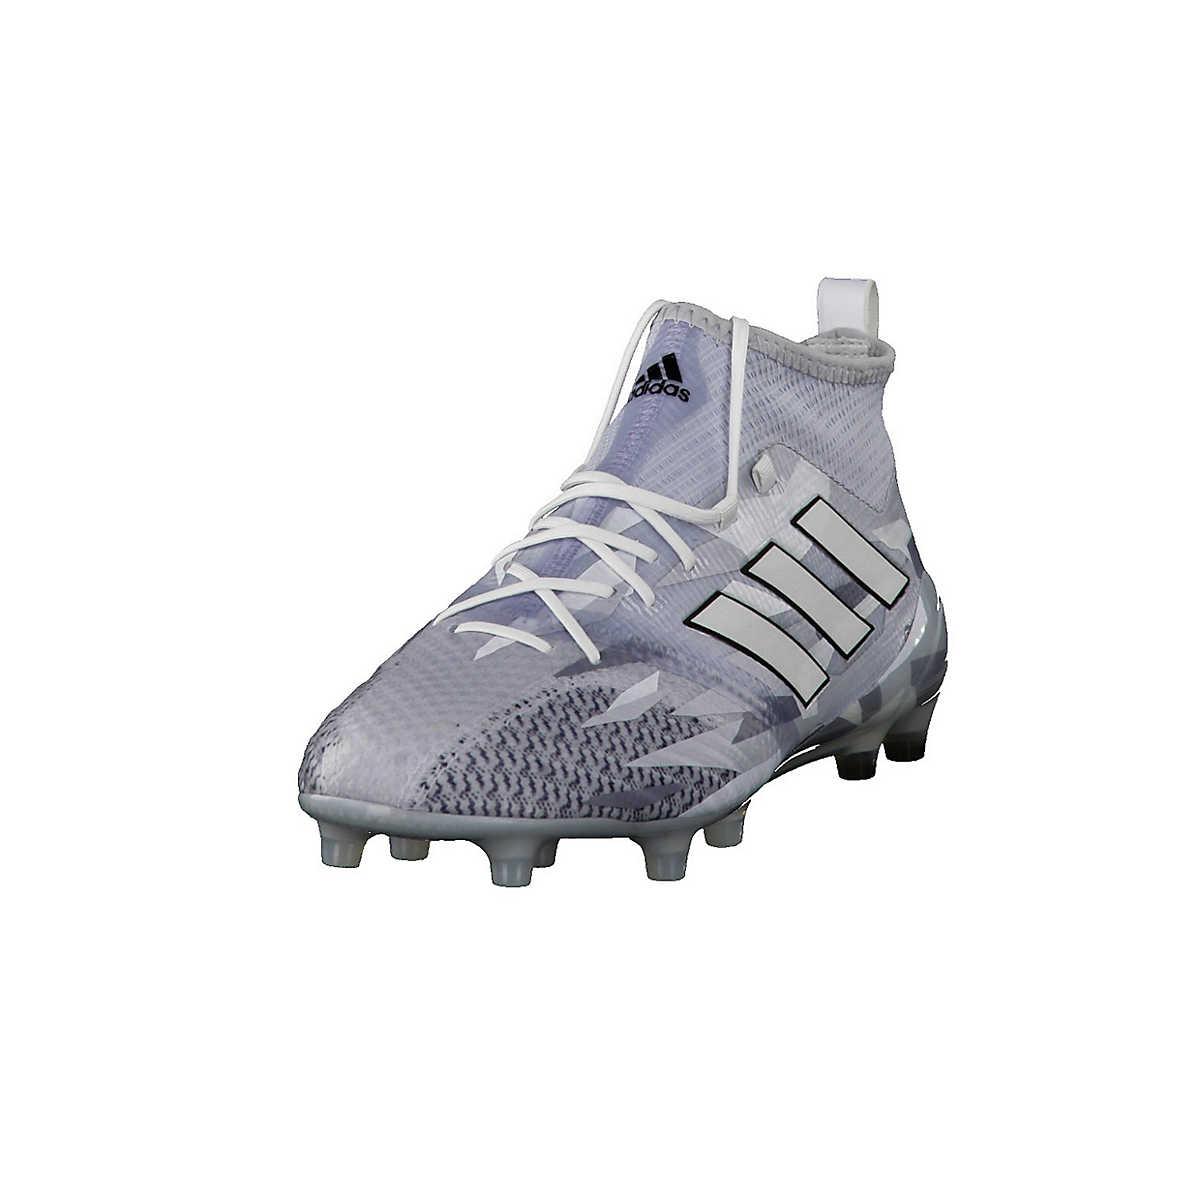 adidas Performance Sportschuhe grau-kombi - adidas Performance - Sportschuhe - Schuhe - mirapodo.de